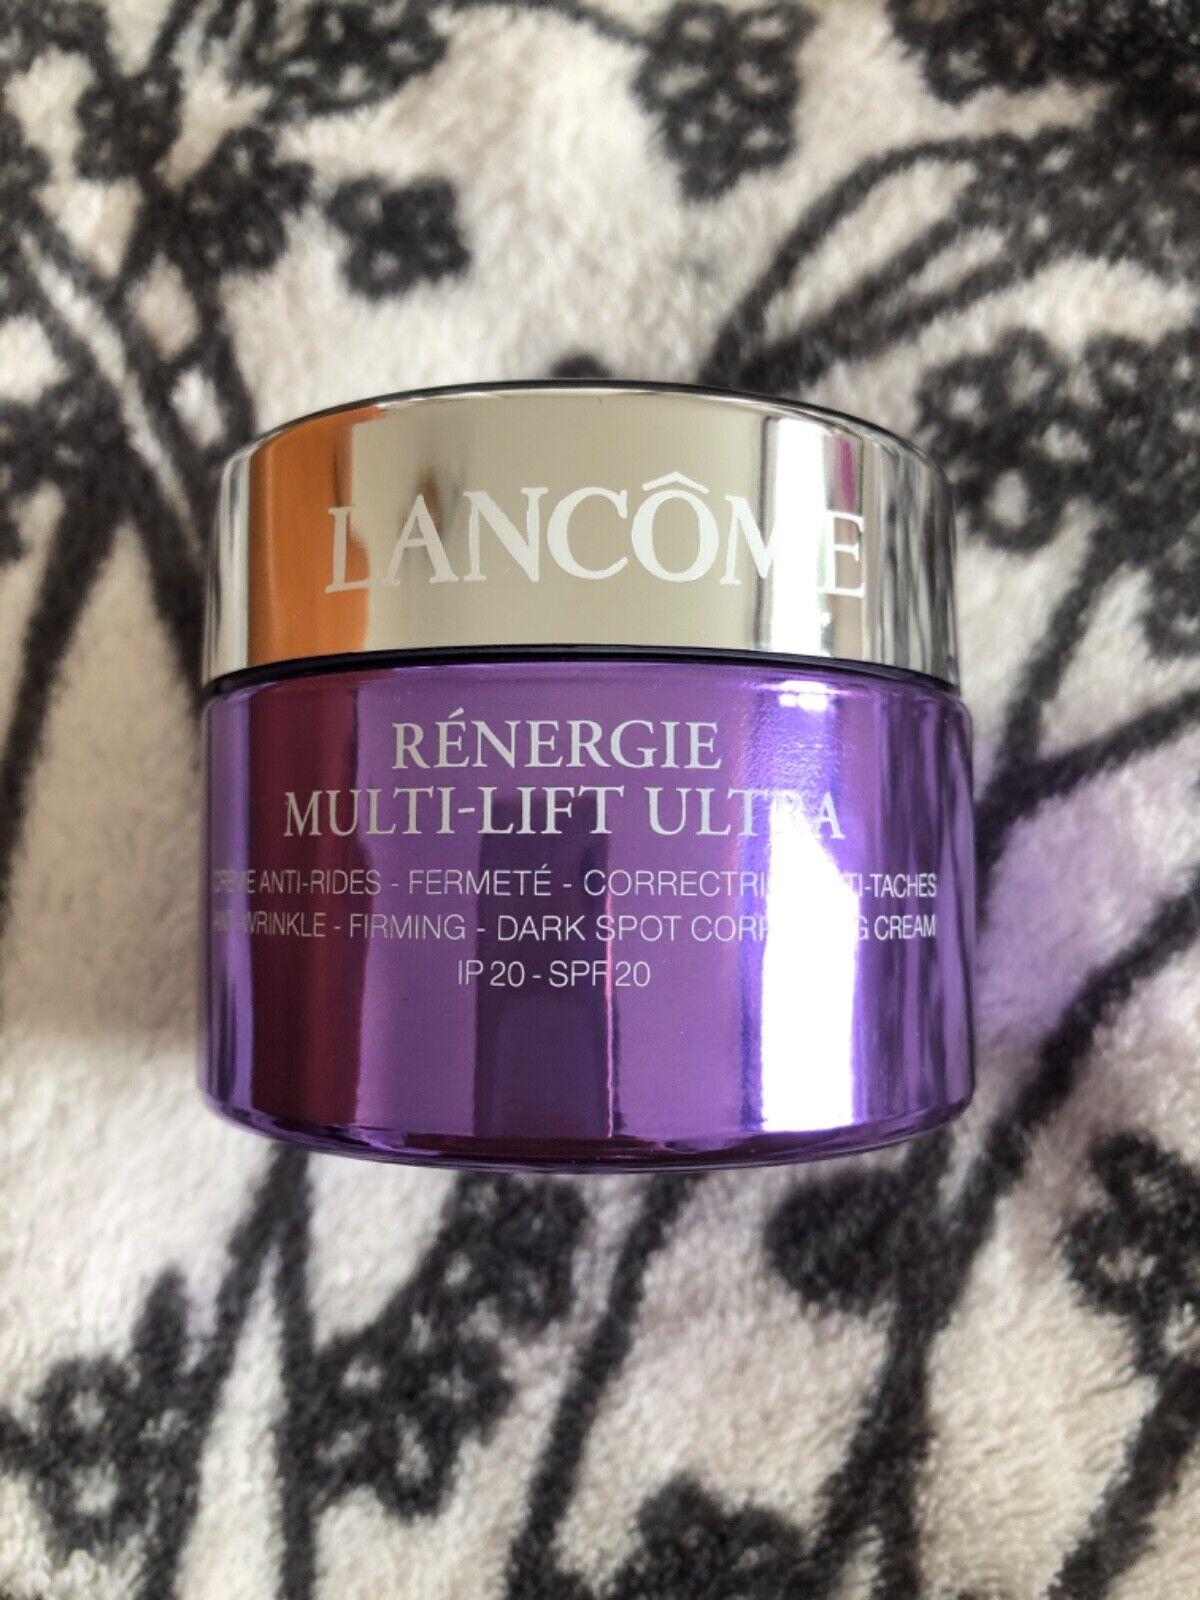 Lancôme  Renergie Multi-Lift ULTRA 50 ml Anti Wrinkle Cream SPF 20